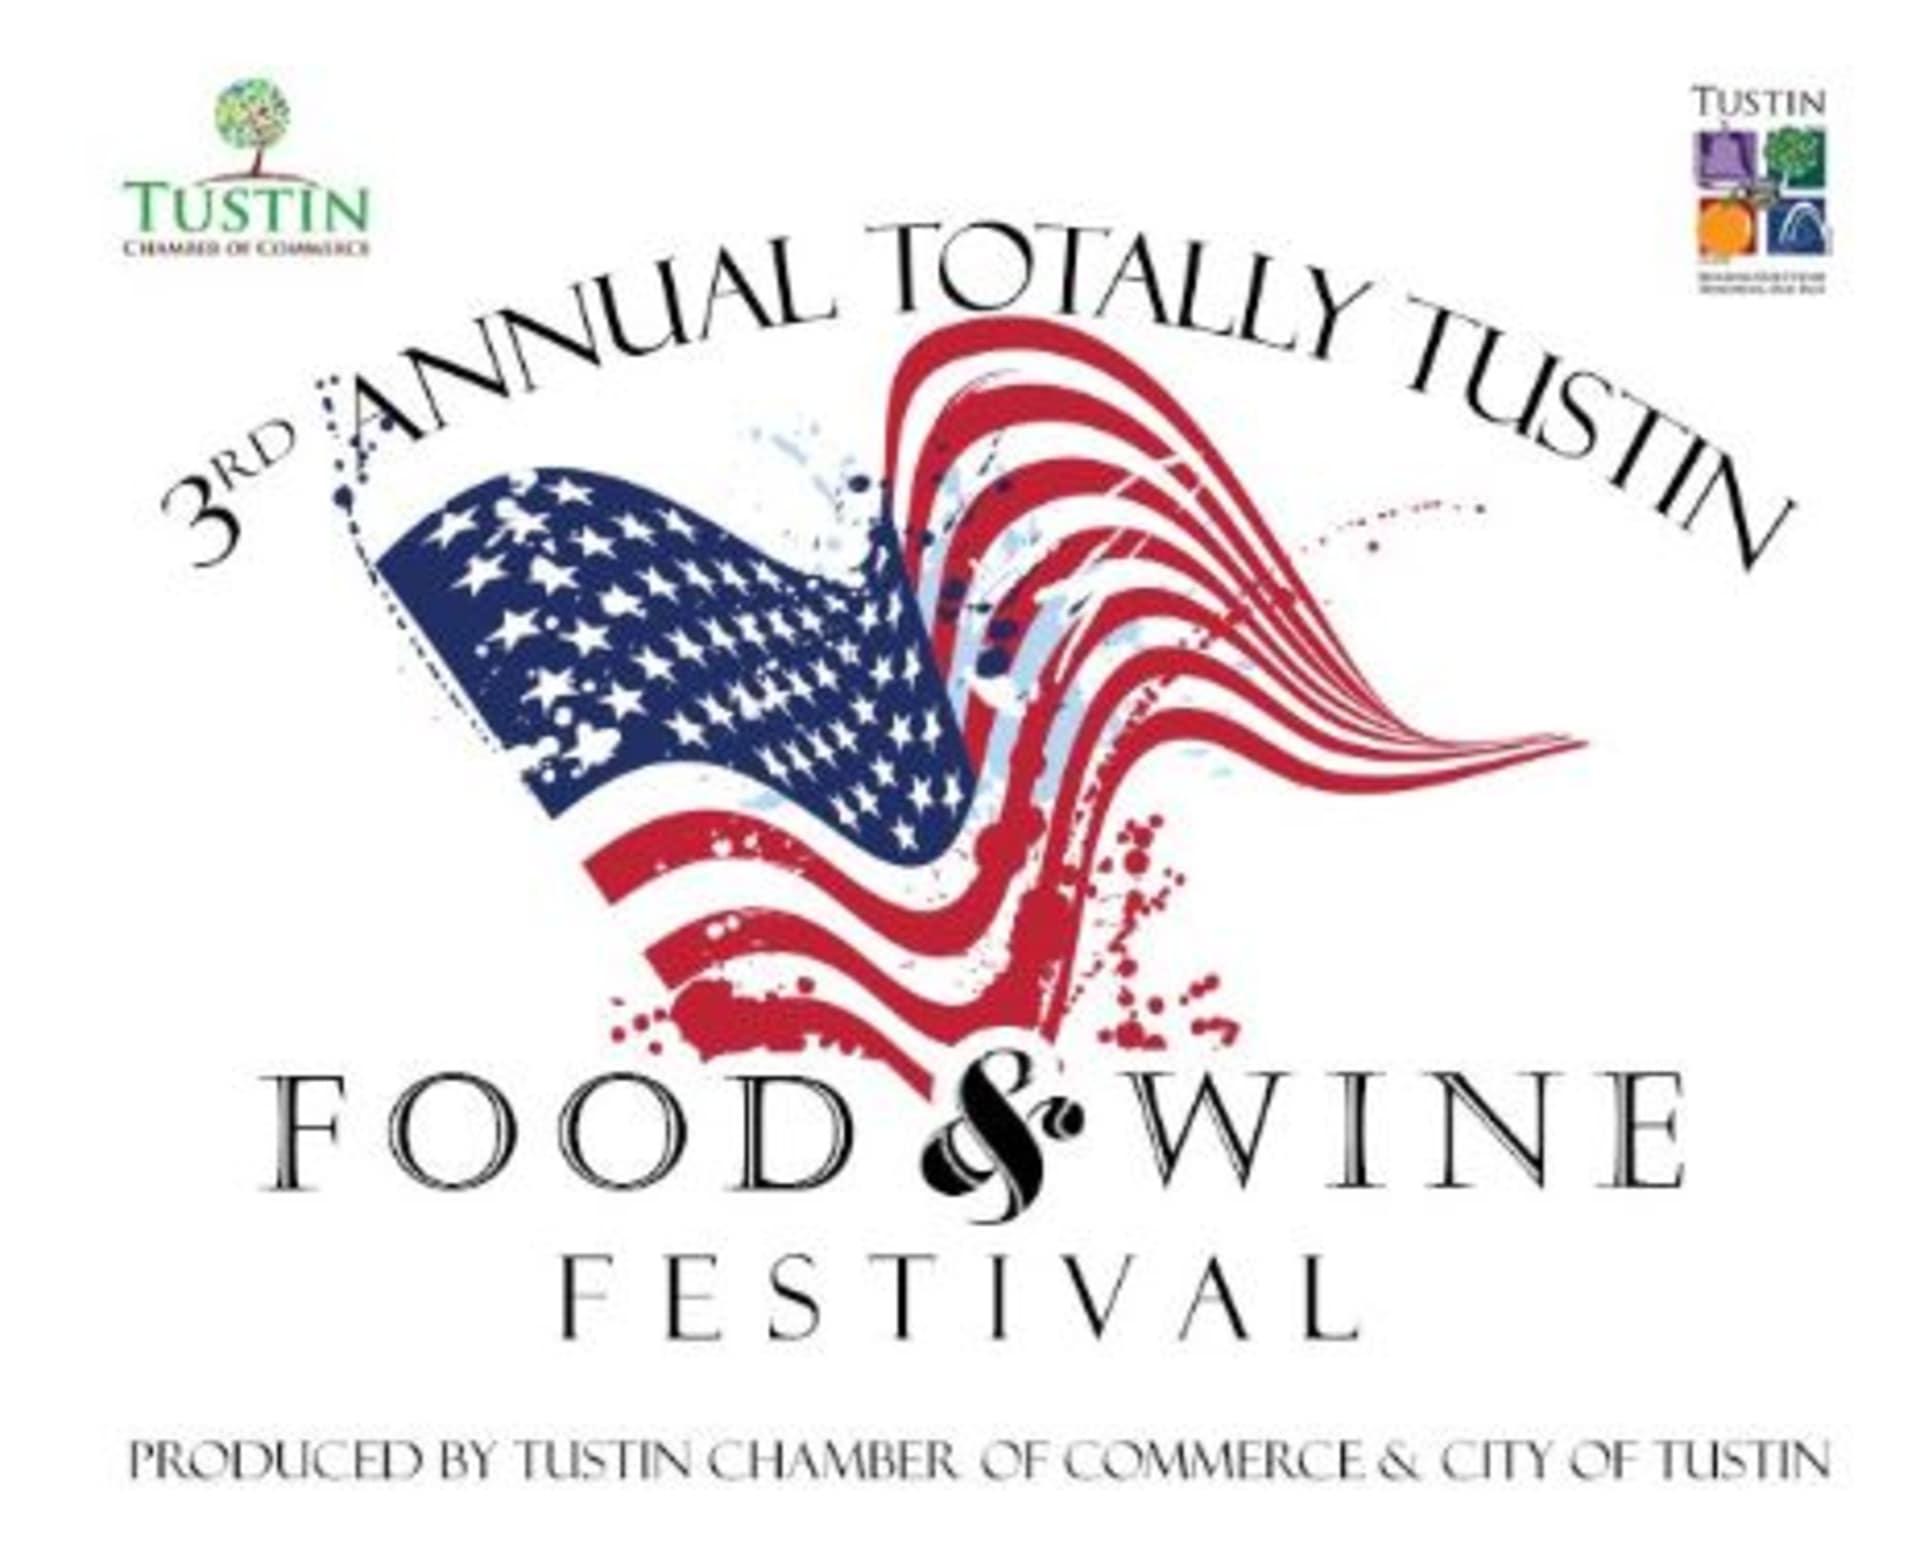 NOV 11 | Totally Tustin Food & Wine Festival